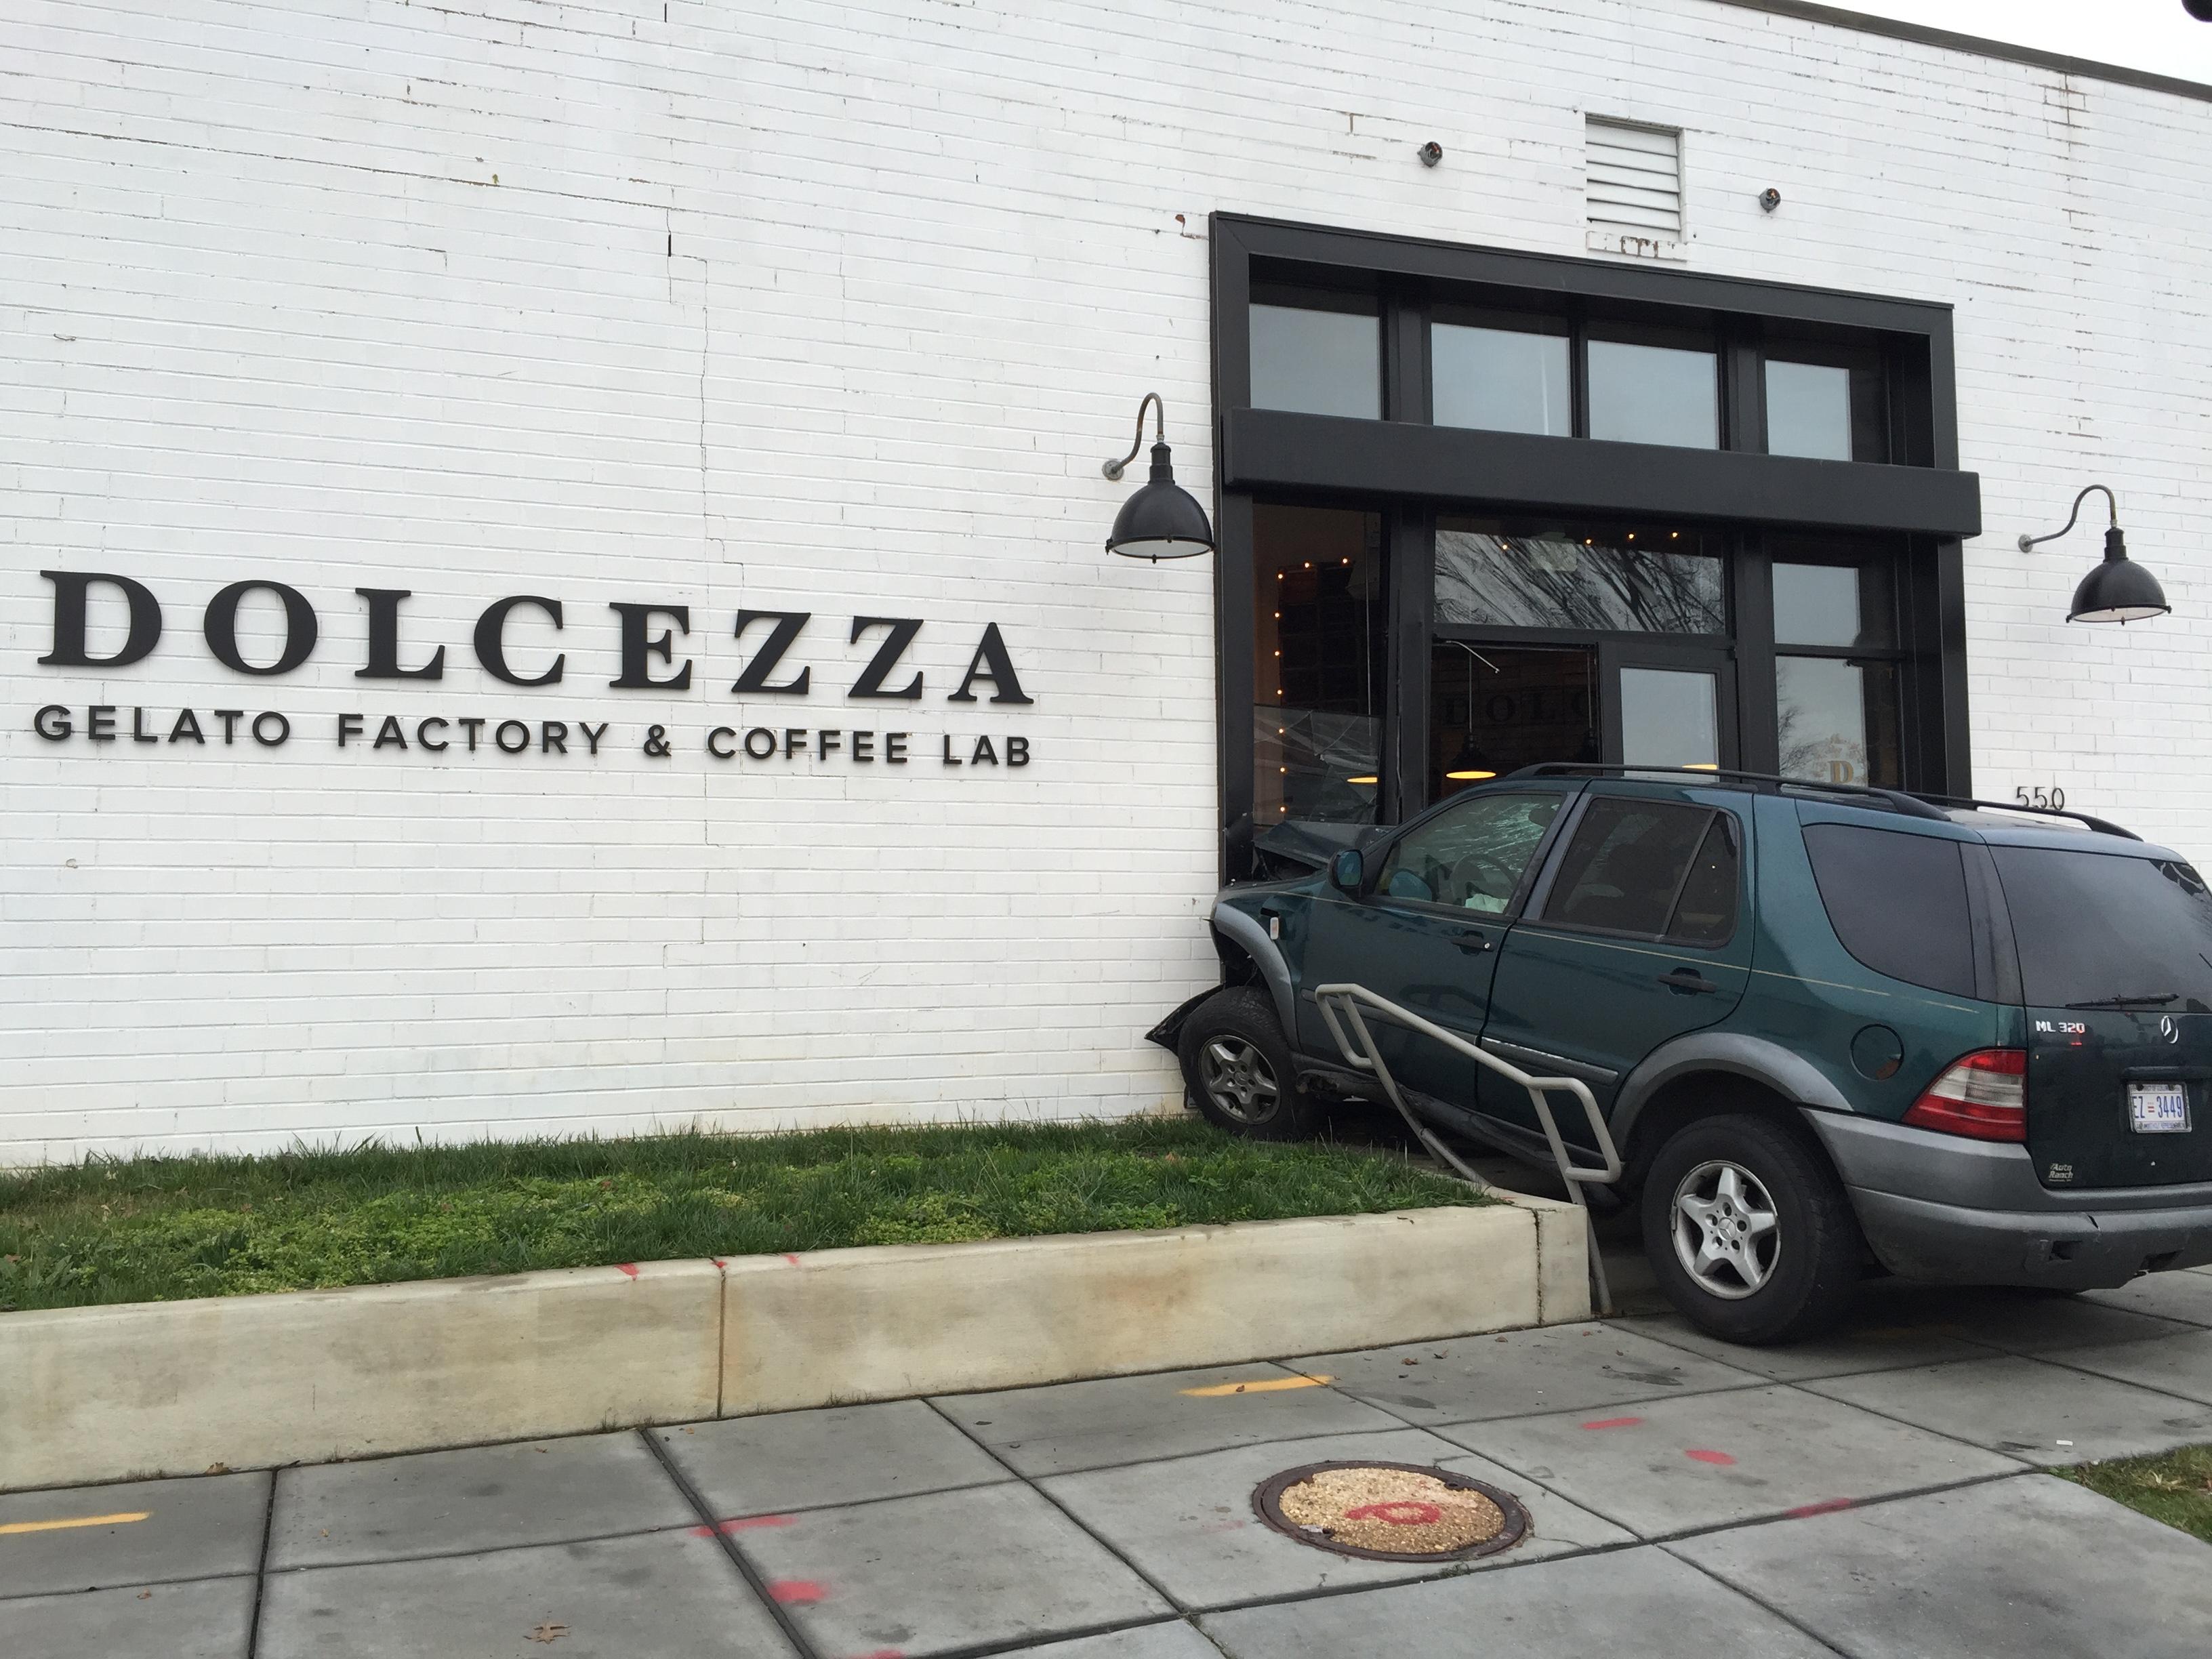 Four hurt after SUV crashes into D.C. gelato shop